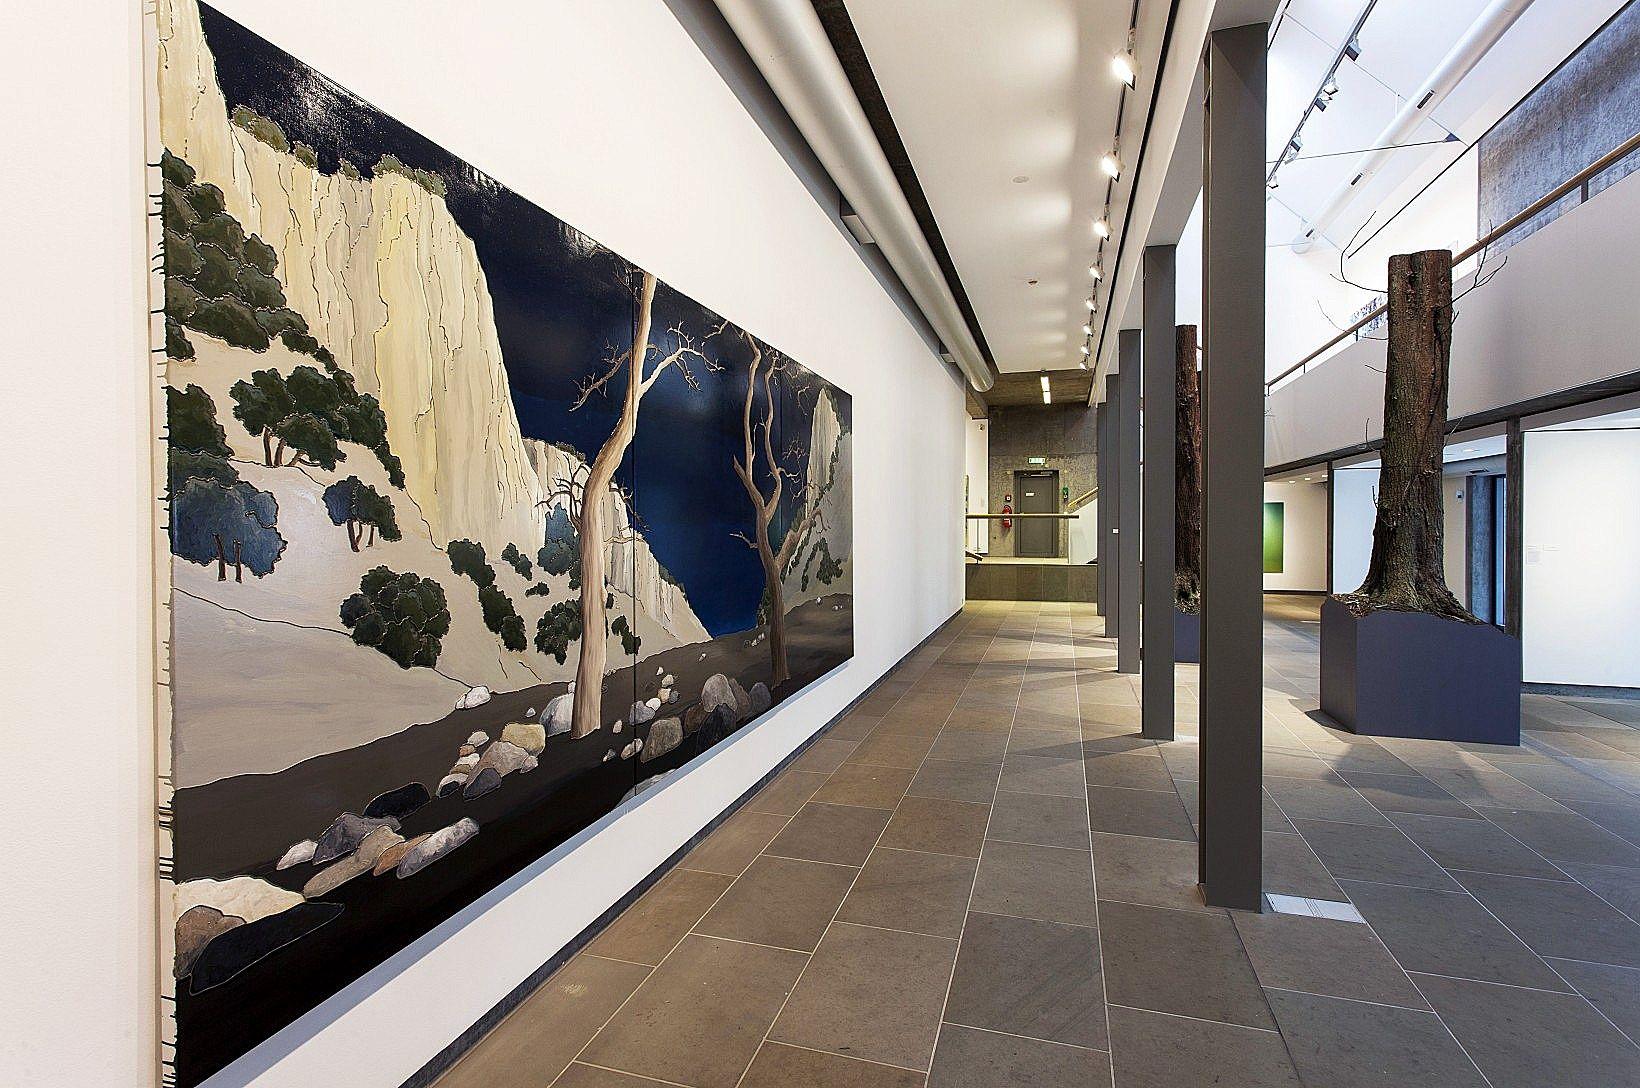 Discovering light - Culture - Municipal Gallery Bietigheim-Bissingen